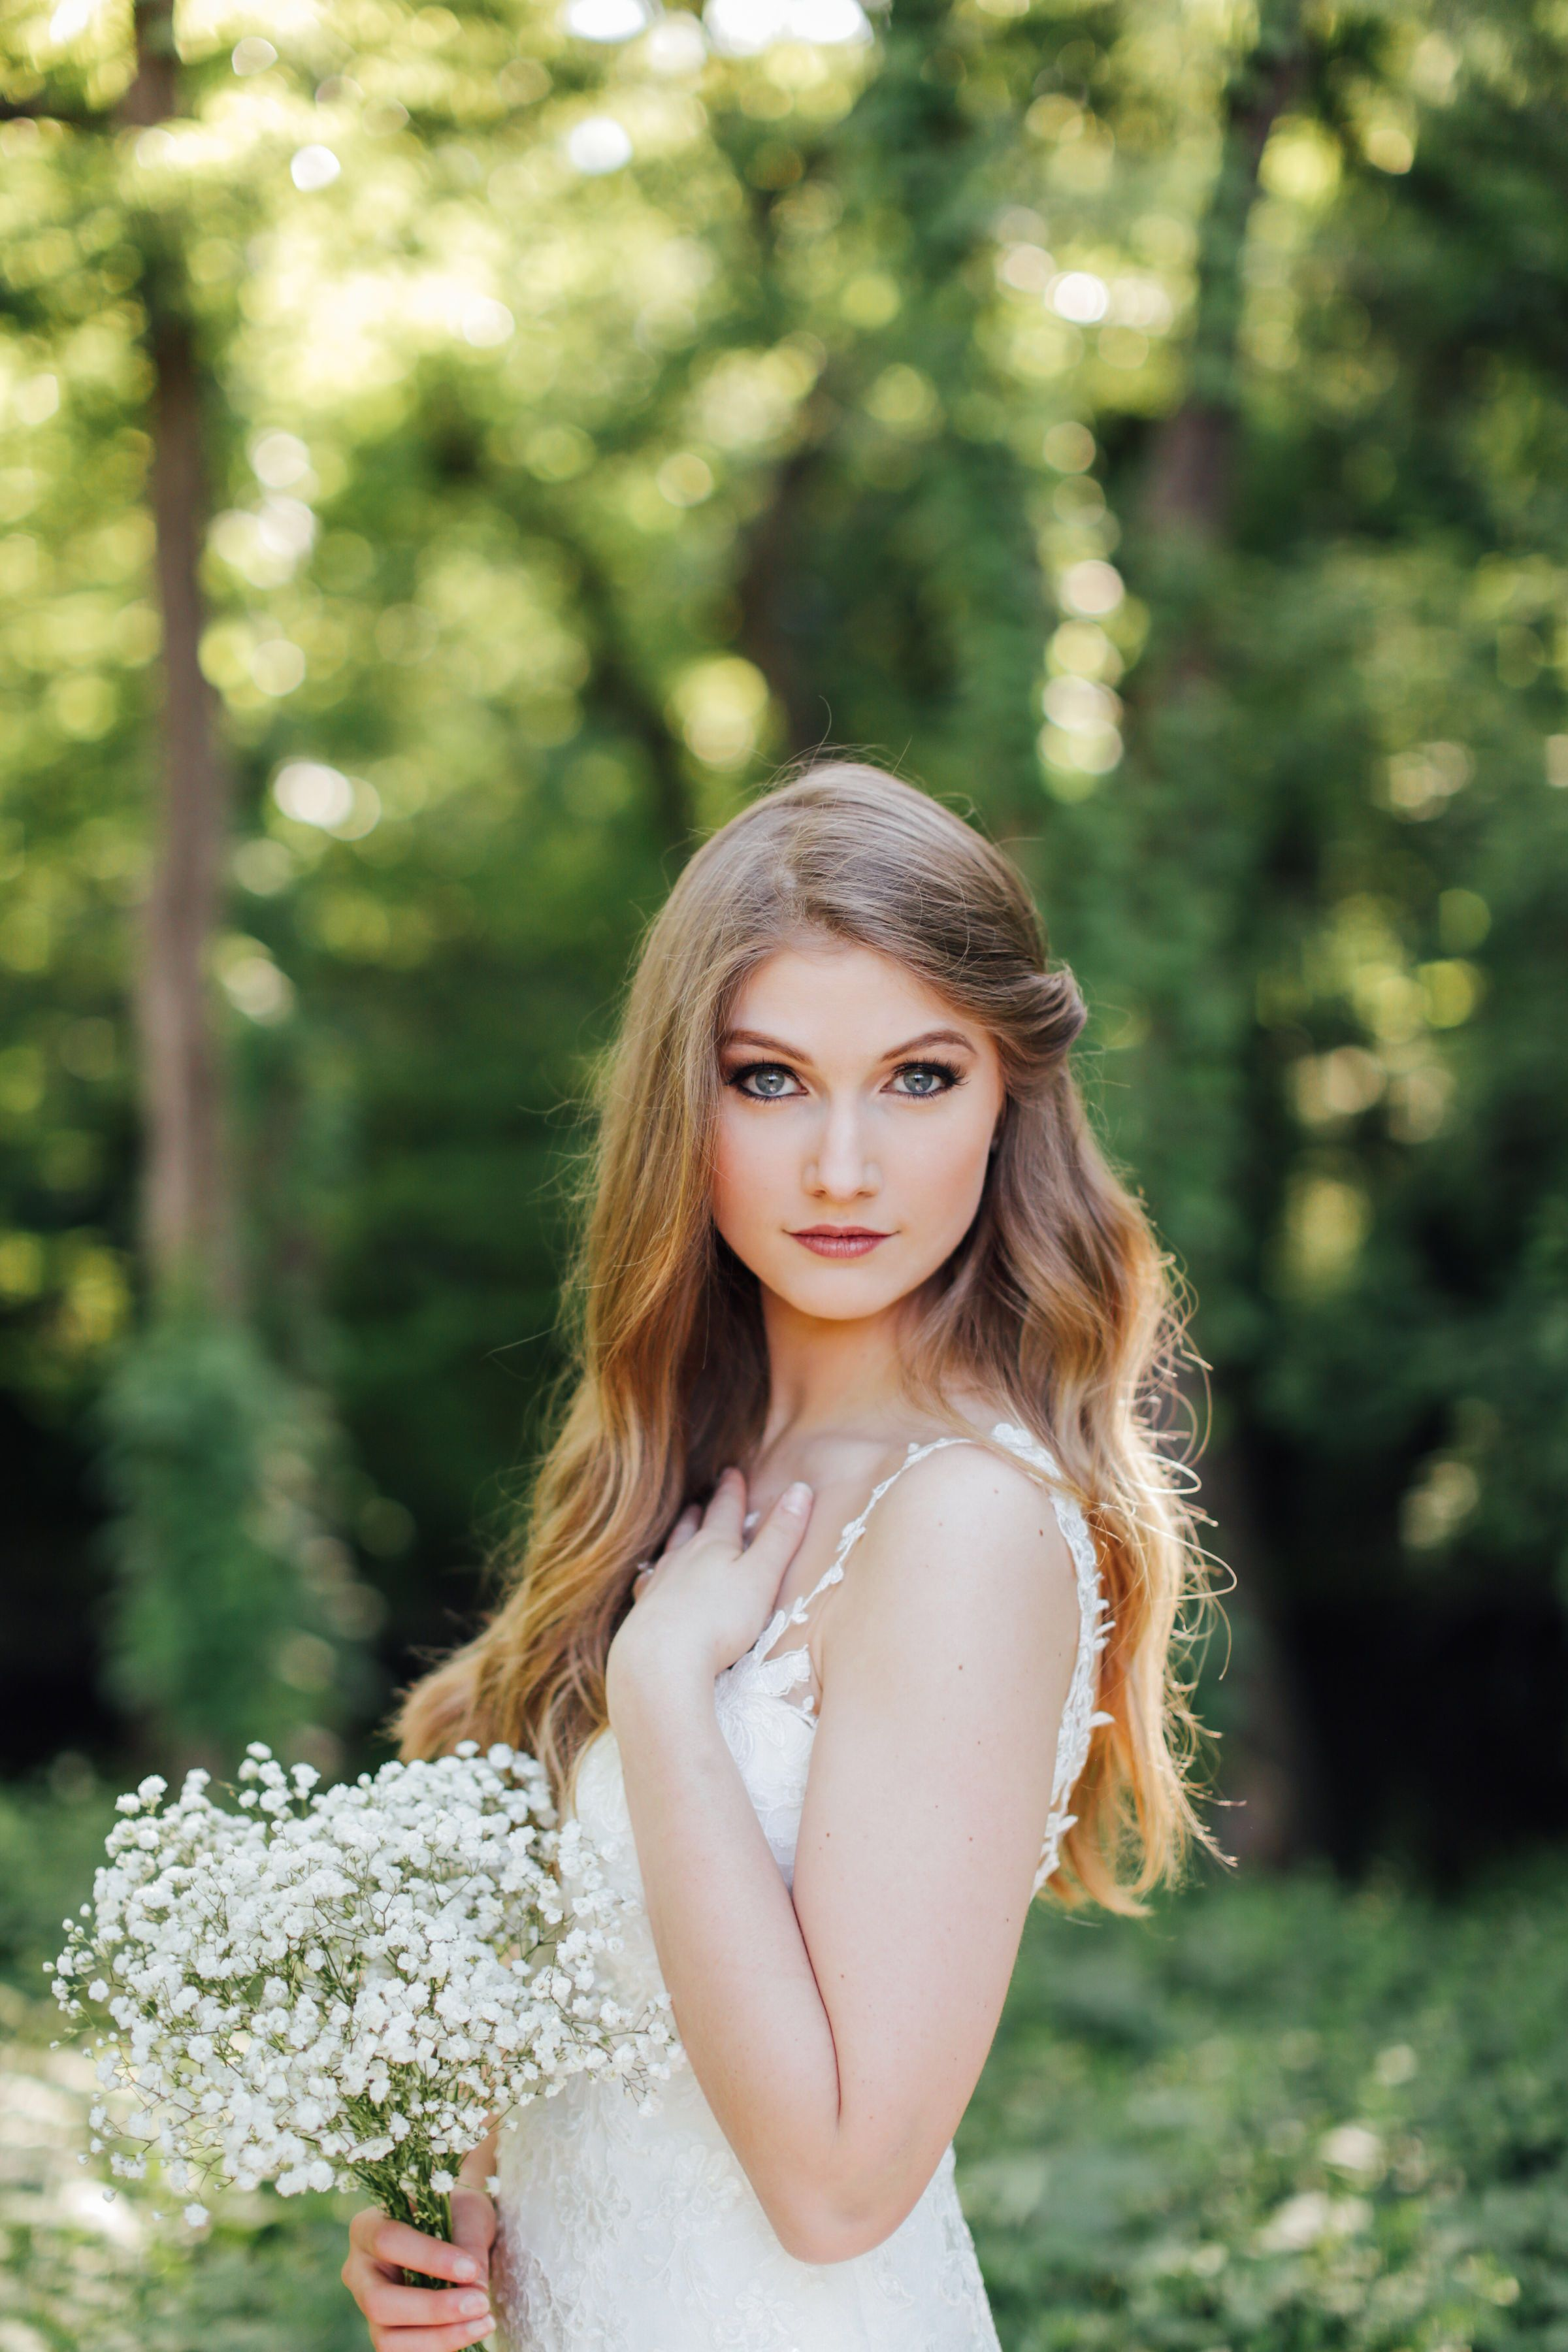 breana marie photography, tyler texas | beauty work in 2019